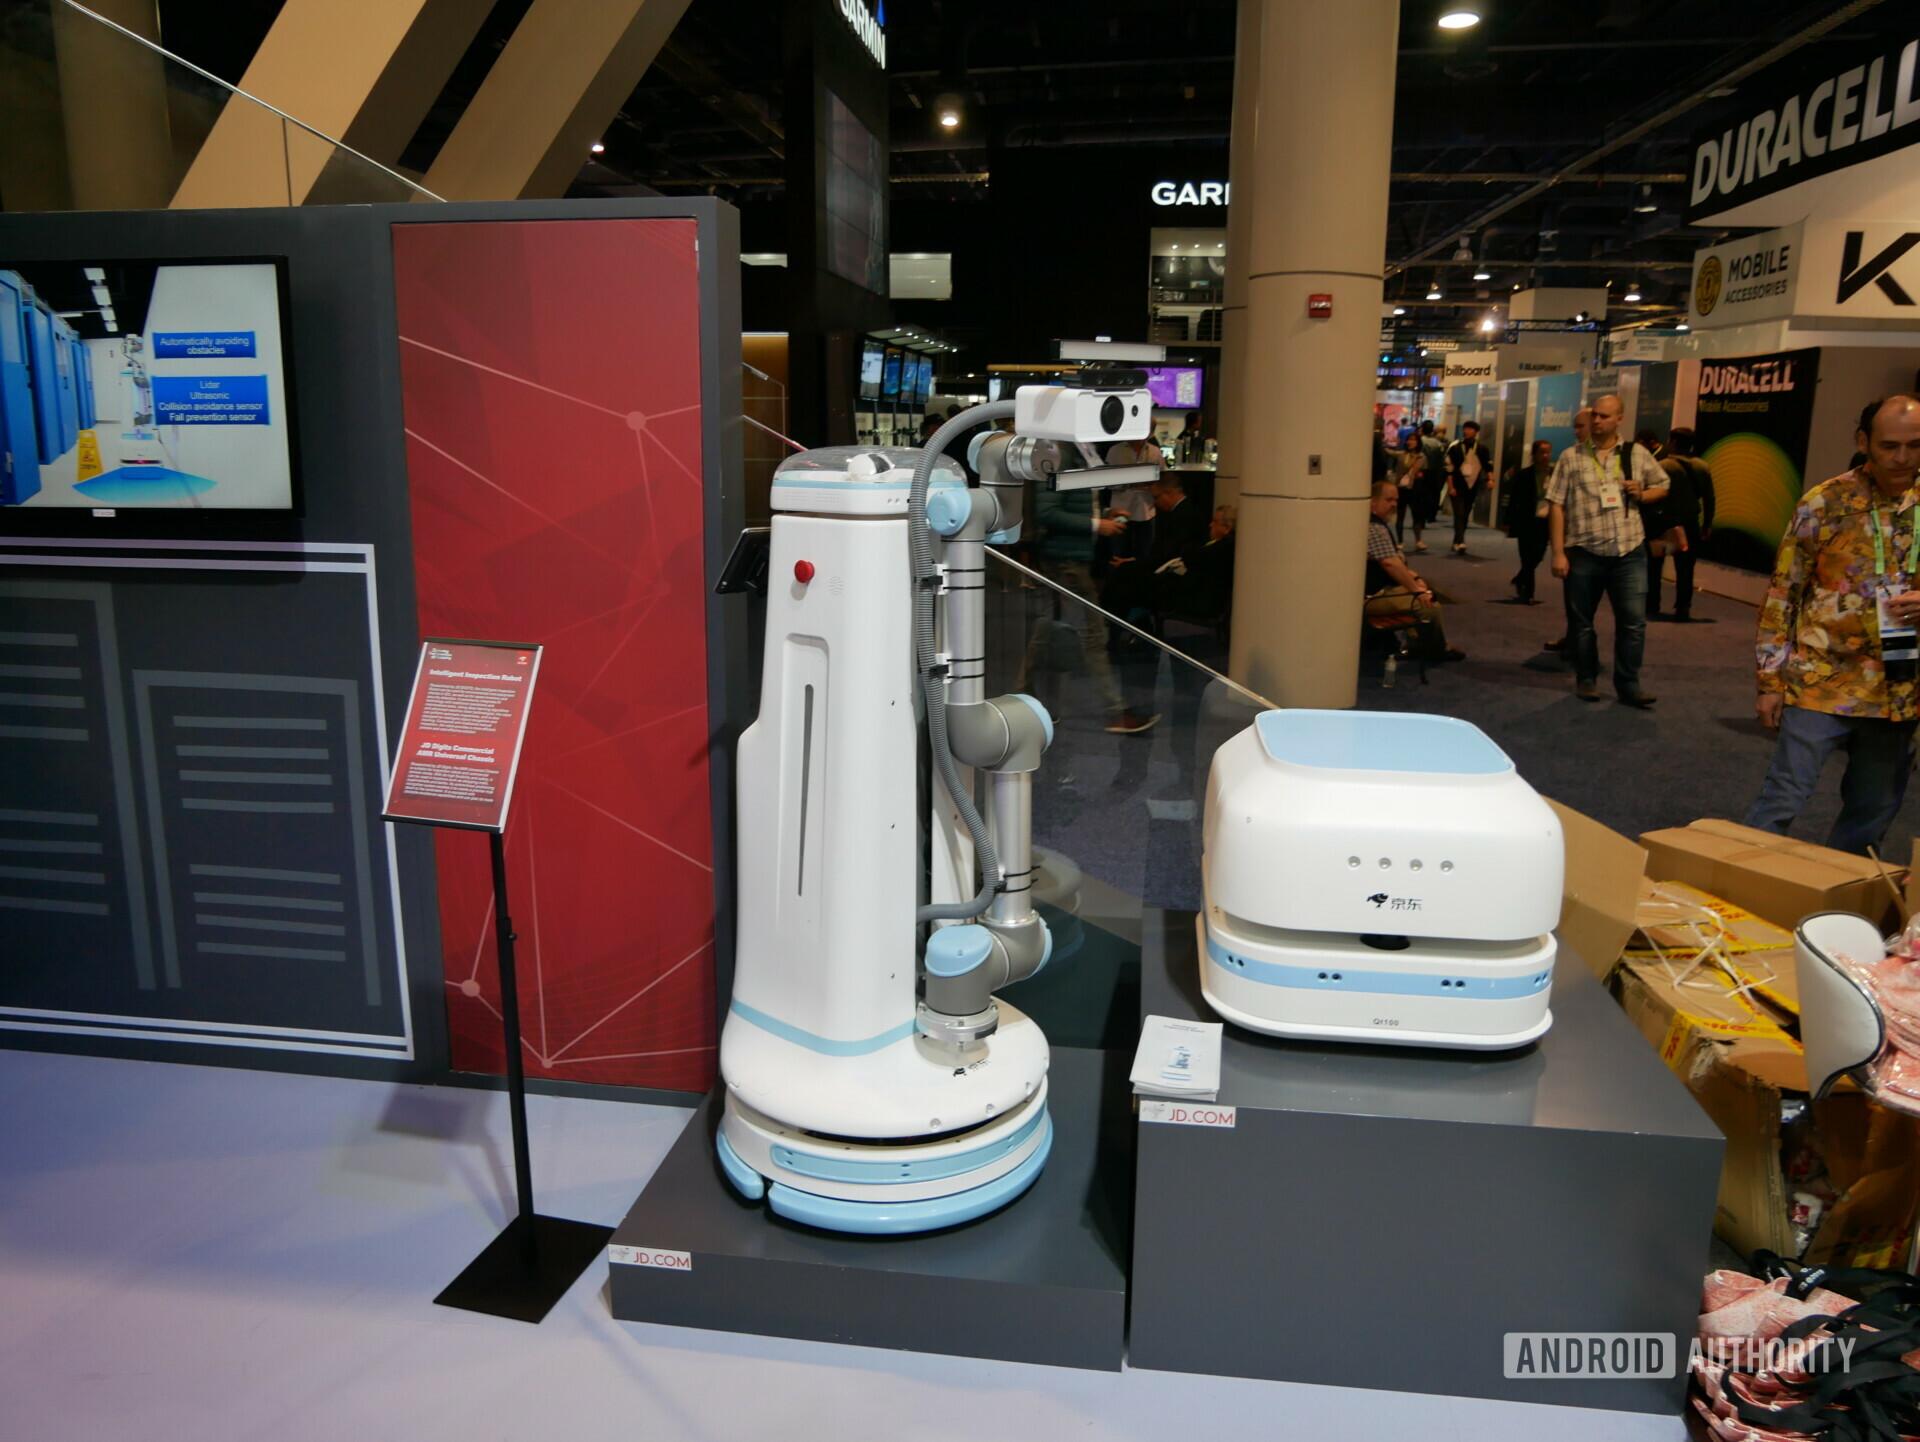 JD Digit has an industrial robot that inspects servers autonomously.